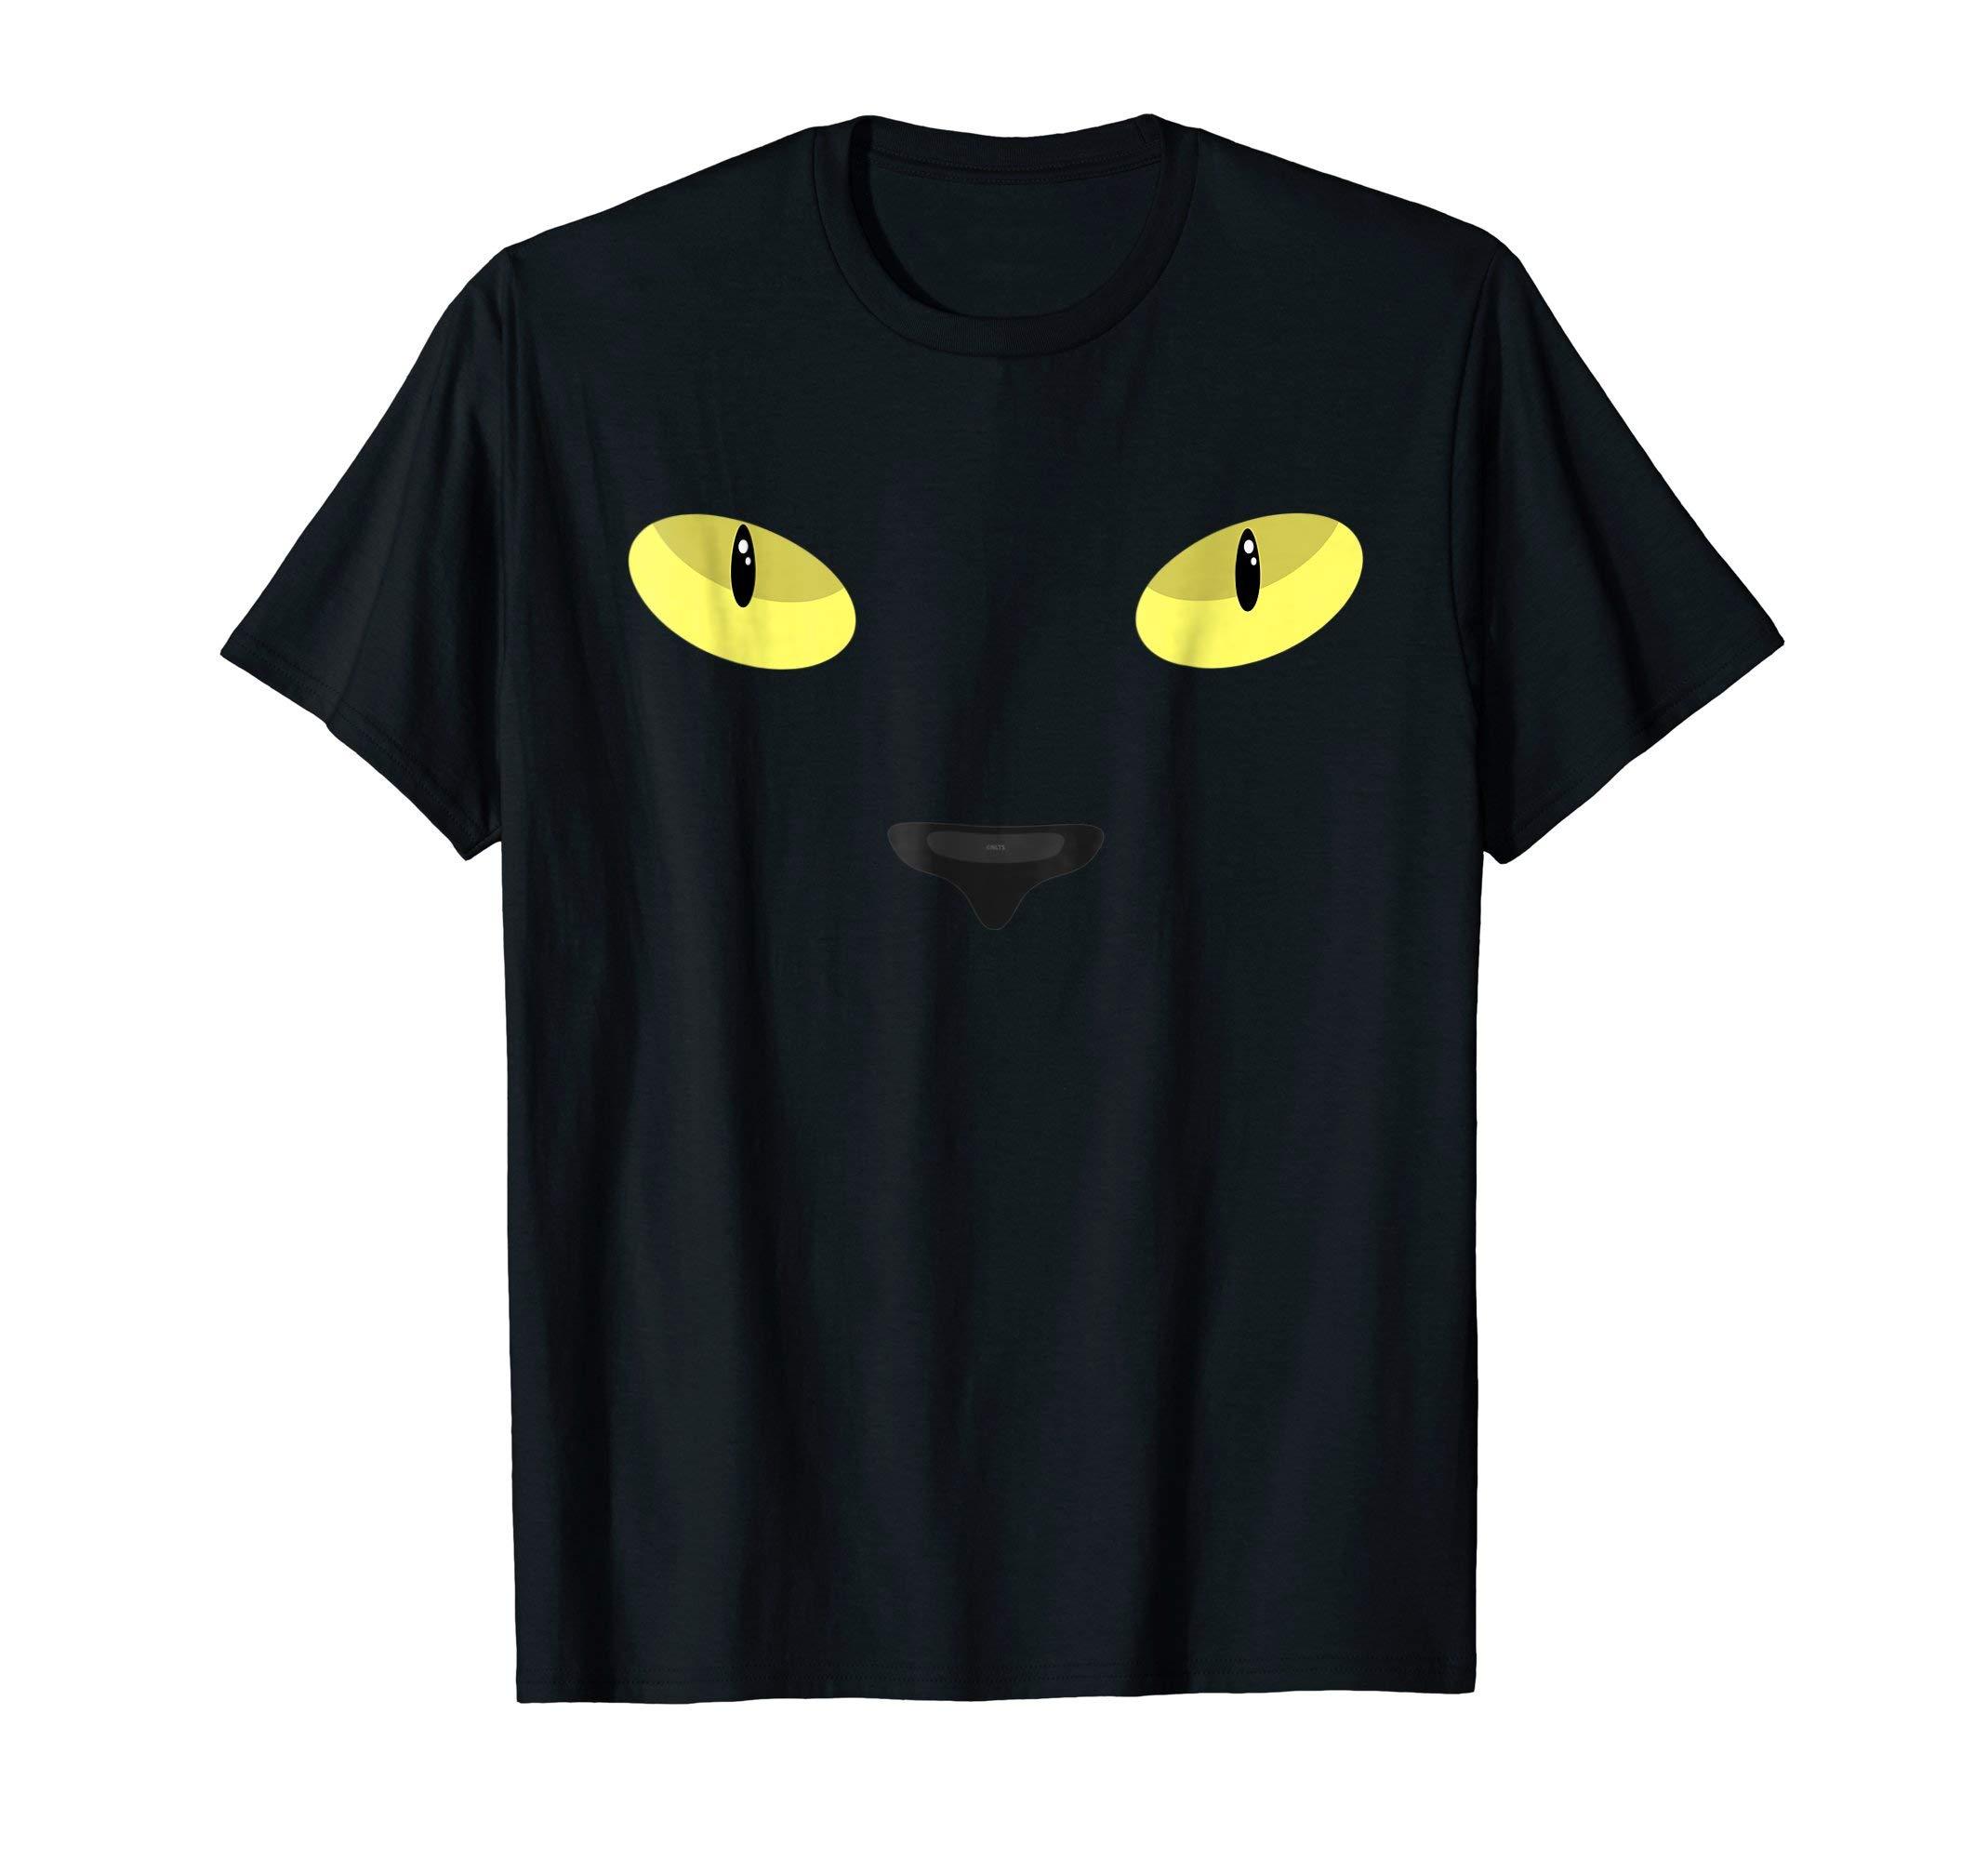 Black-Cat-Eyes-Halloween-Novelty-T-Shirt-Tee-Gifts